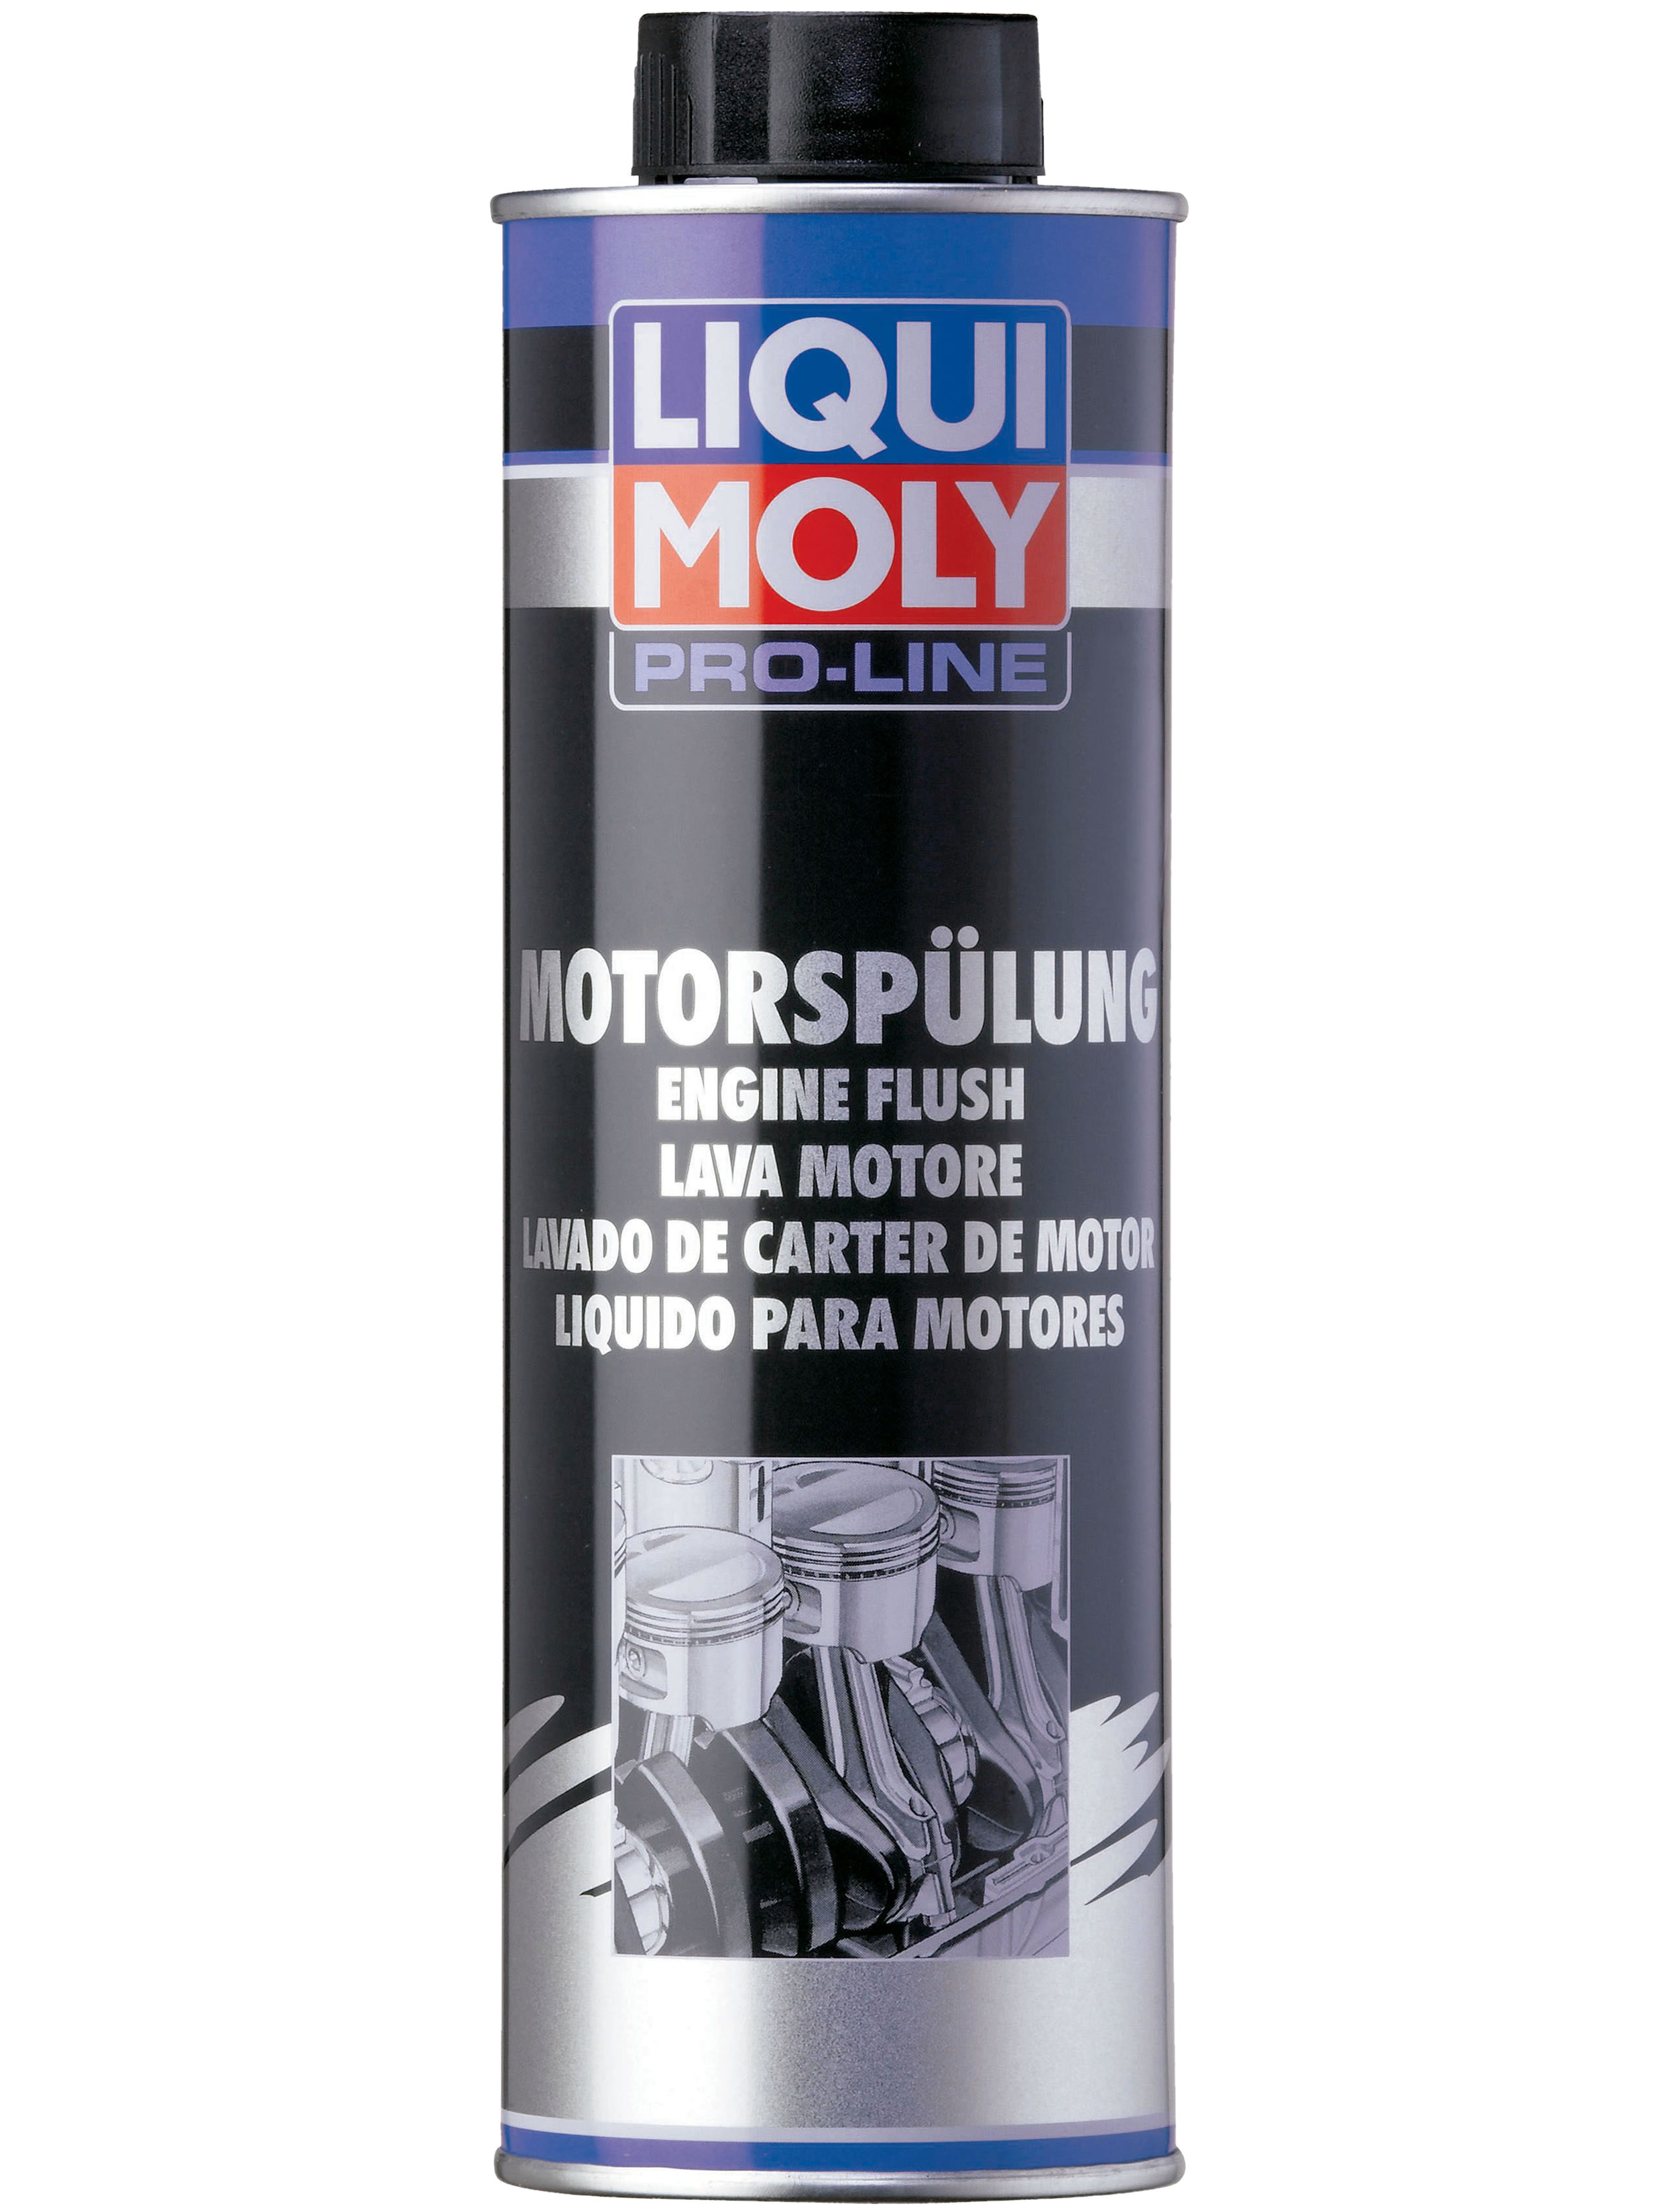 liqui moly pro line engine flush 500ml roughtrax 4x4. Black Bedroom Furniture Sets. Home Design Ideas